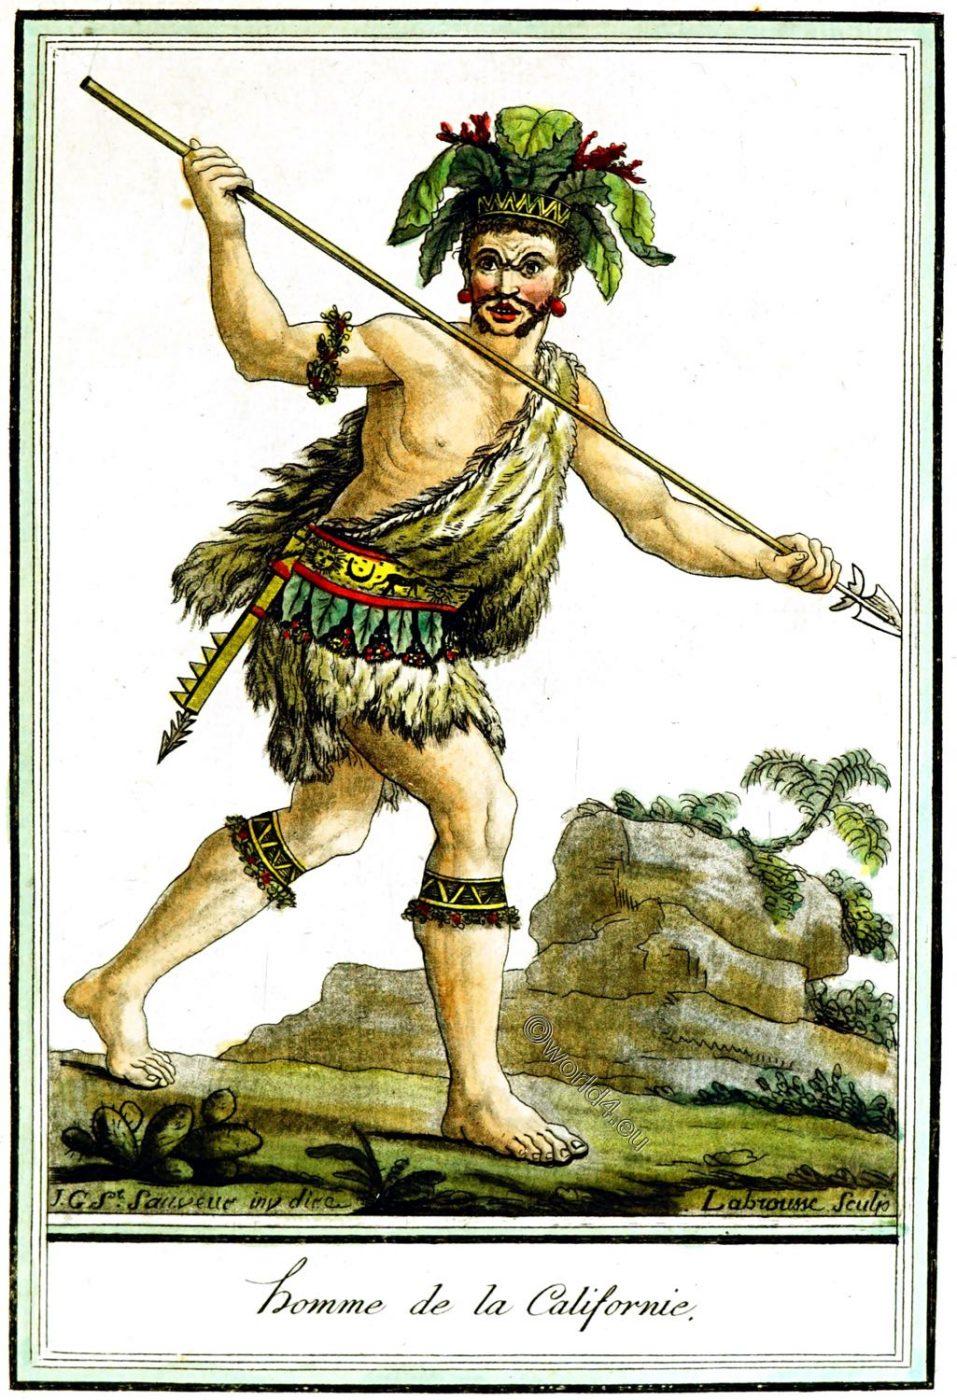 California,Native, Californian, clothing, Jacques Grasset de Saint-Sauveur